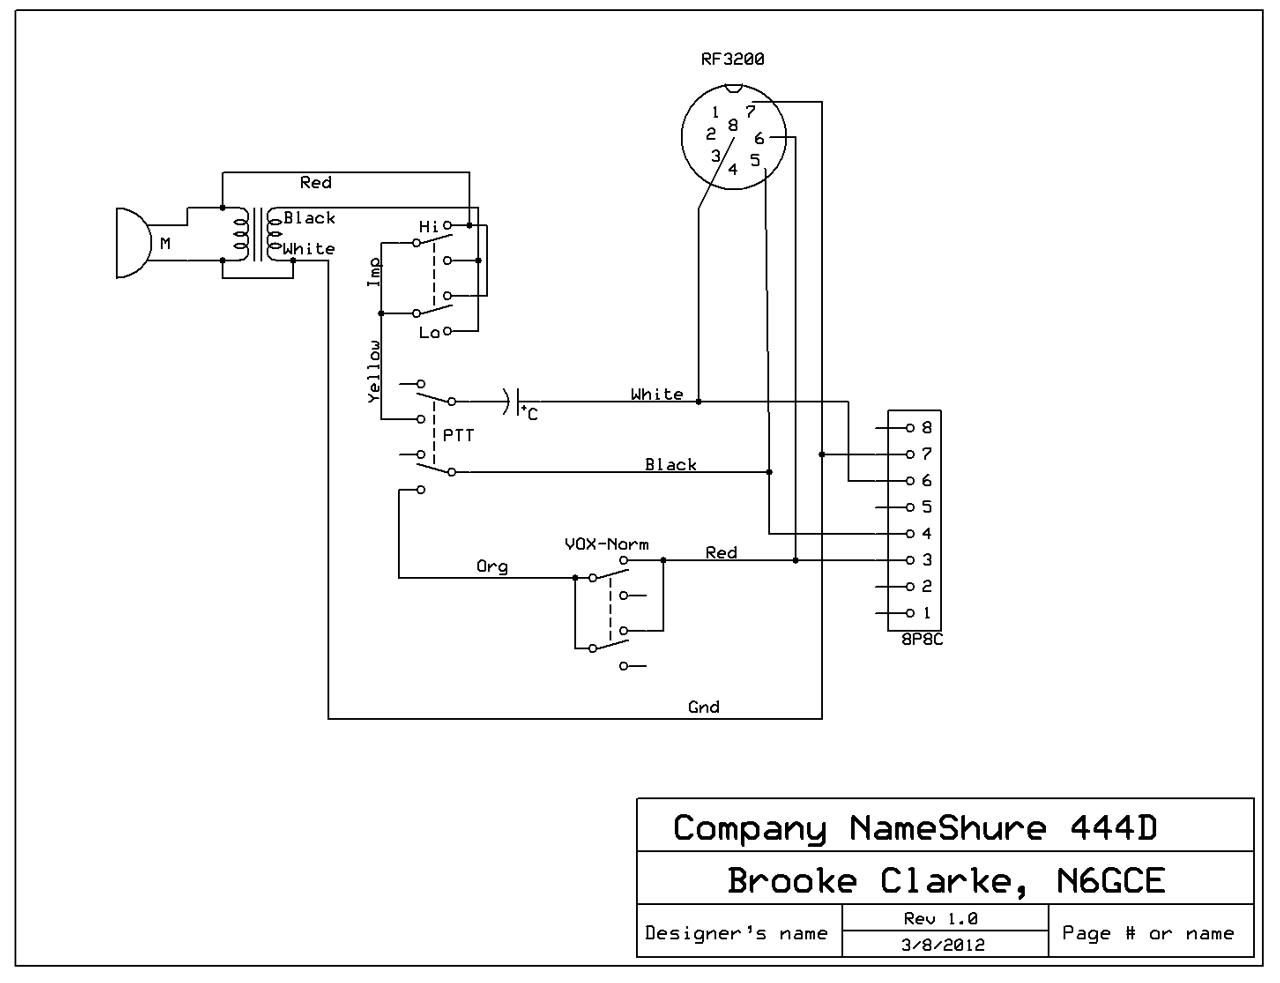 shure 444 mic wiring diagram wiring diagrams source microphone shure 444 wiring diagram wiring diagram for you u2022 wiring condenser microphone shure 444 mic wiring diagram